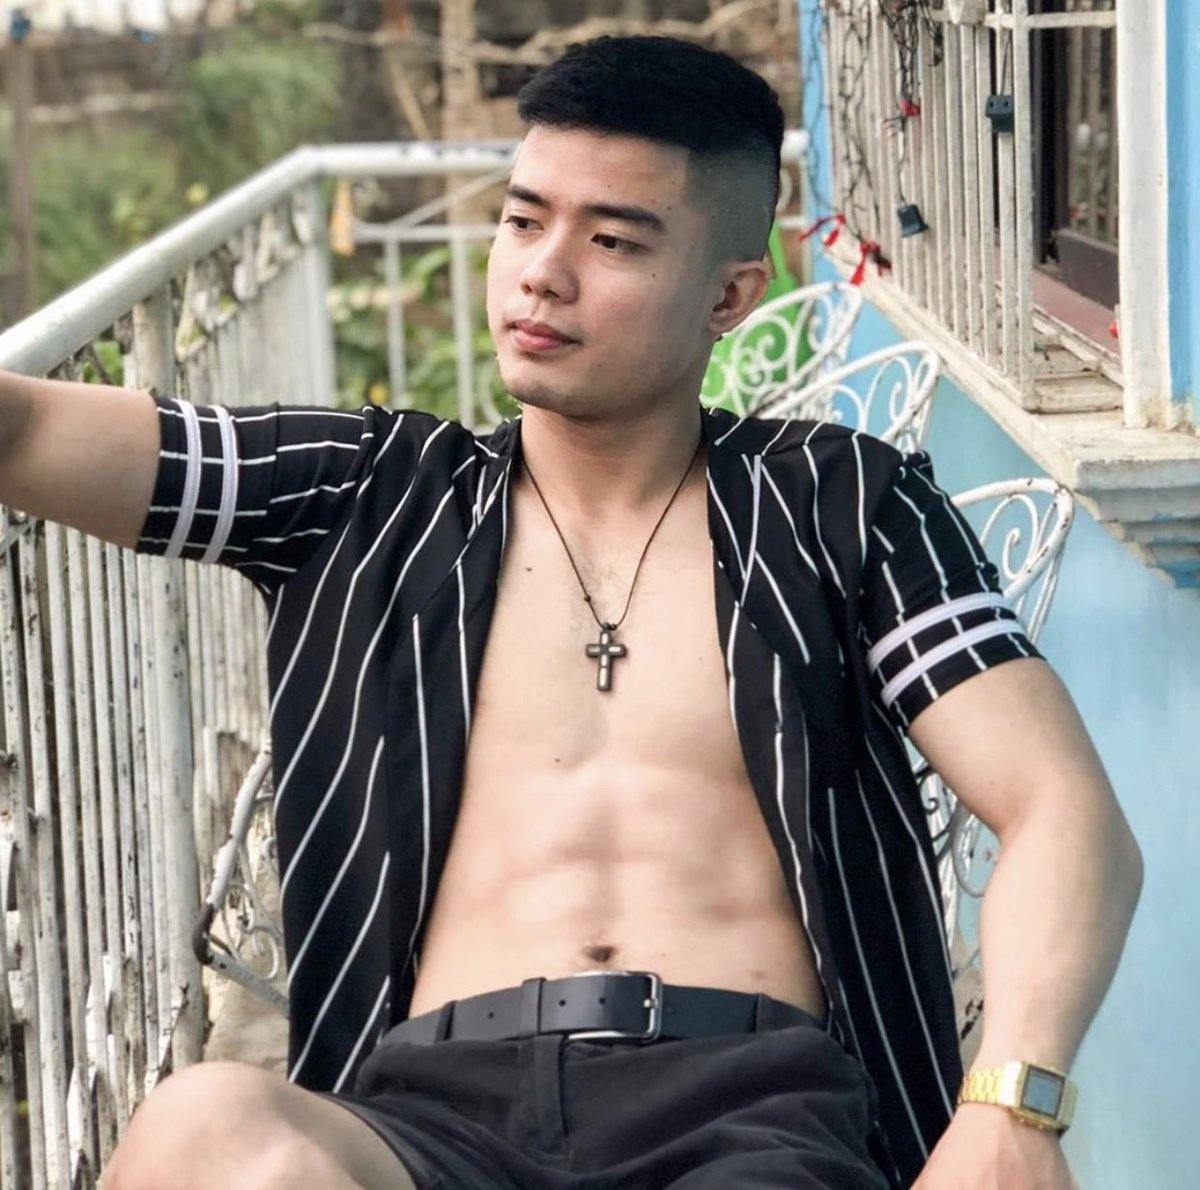 IG: baeph.spotted #baephspotted  #pinoy  #sexypinoy #pinoybae #pinoymodel  #model #malemodel #pinoy #pinoymodel #pogi #bae #baeph #hotpinoy #pinoyunderwear #cutepinoy #filipino #likesforlikesback #likesforlikespic.twitter.com/hGgmxiz7WL